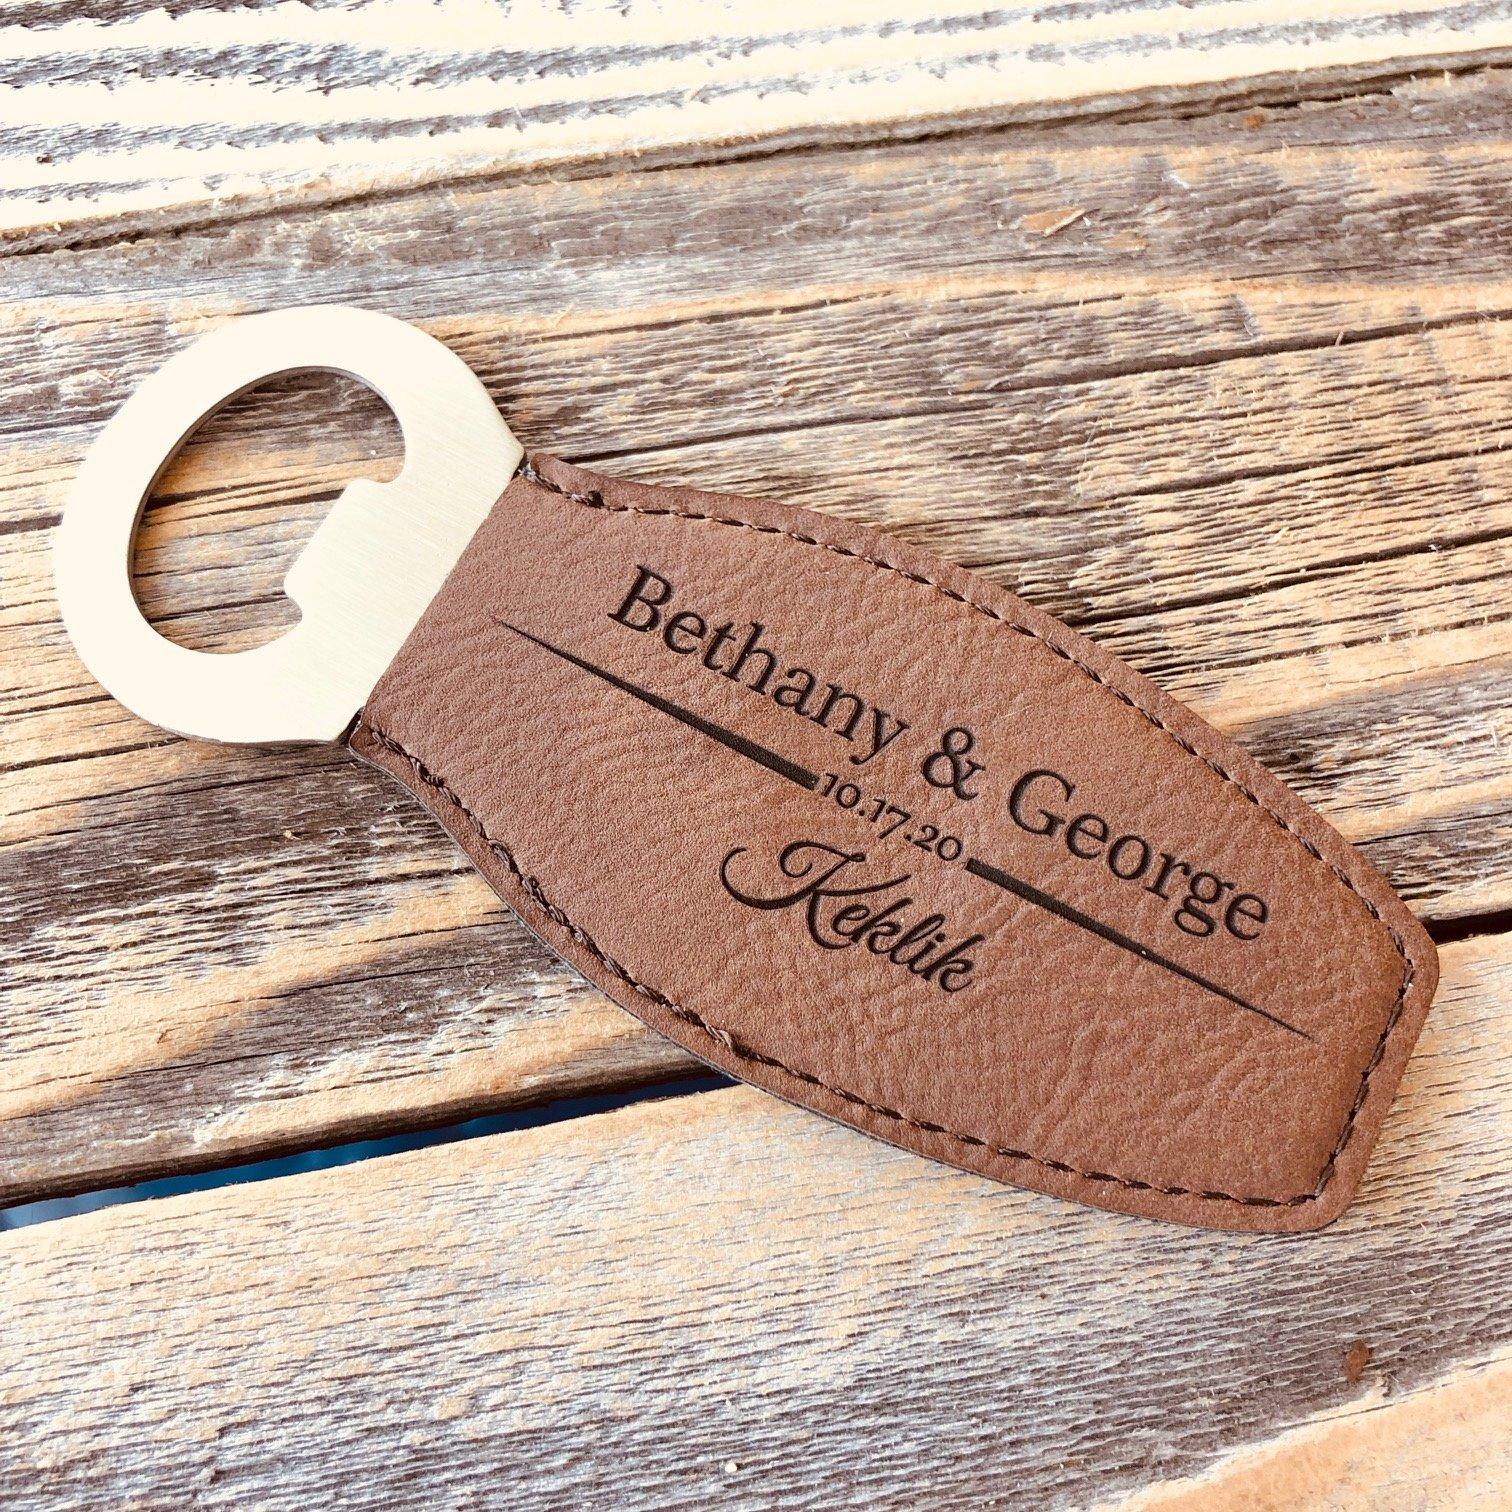 Unique Bottle Opener Favors For Wedding Guests